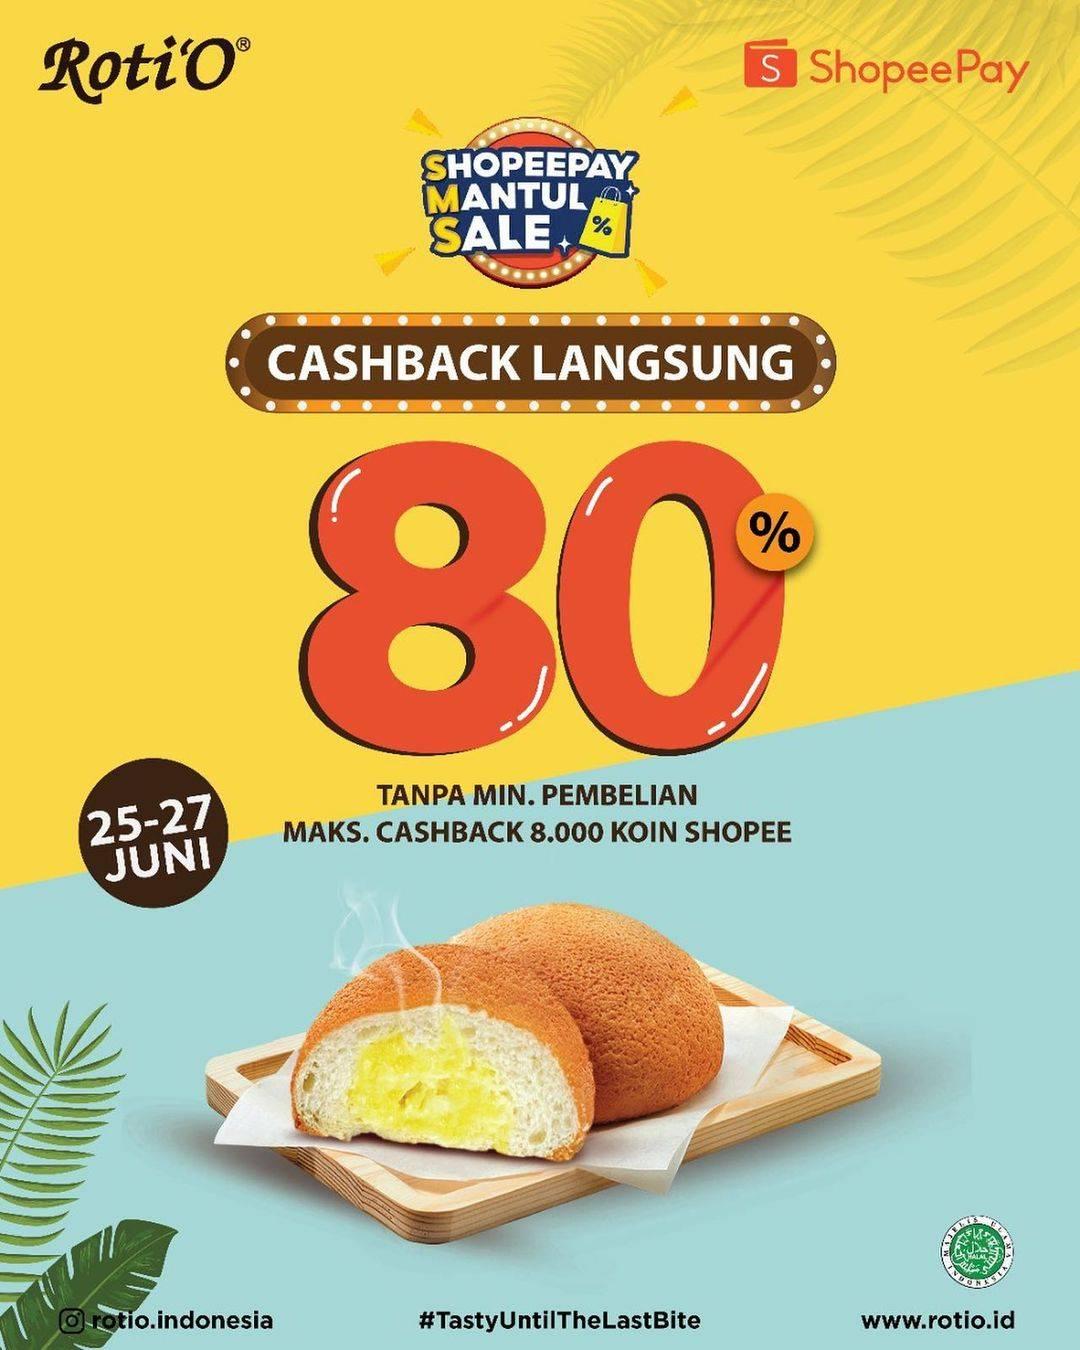 Diskon Roti'O Cashback Langsung 80% Dengan Shopeepay